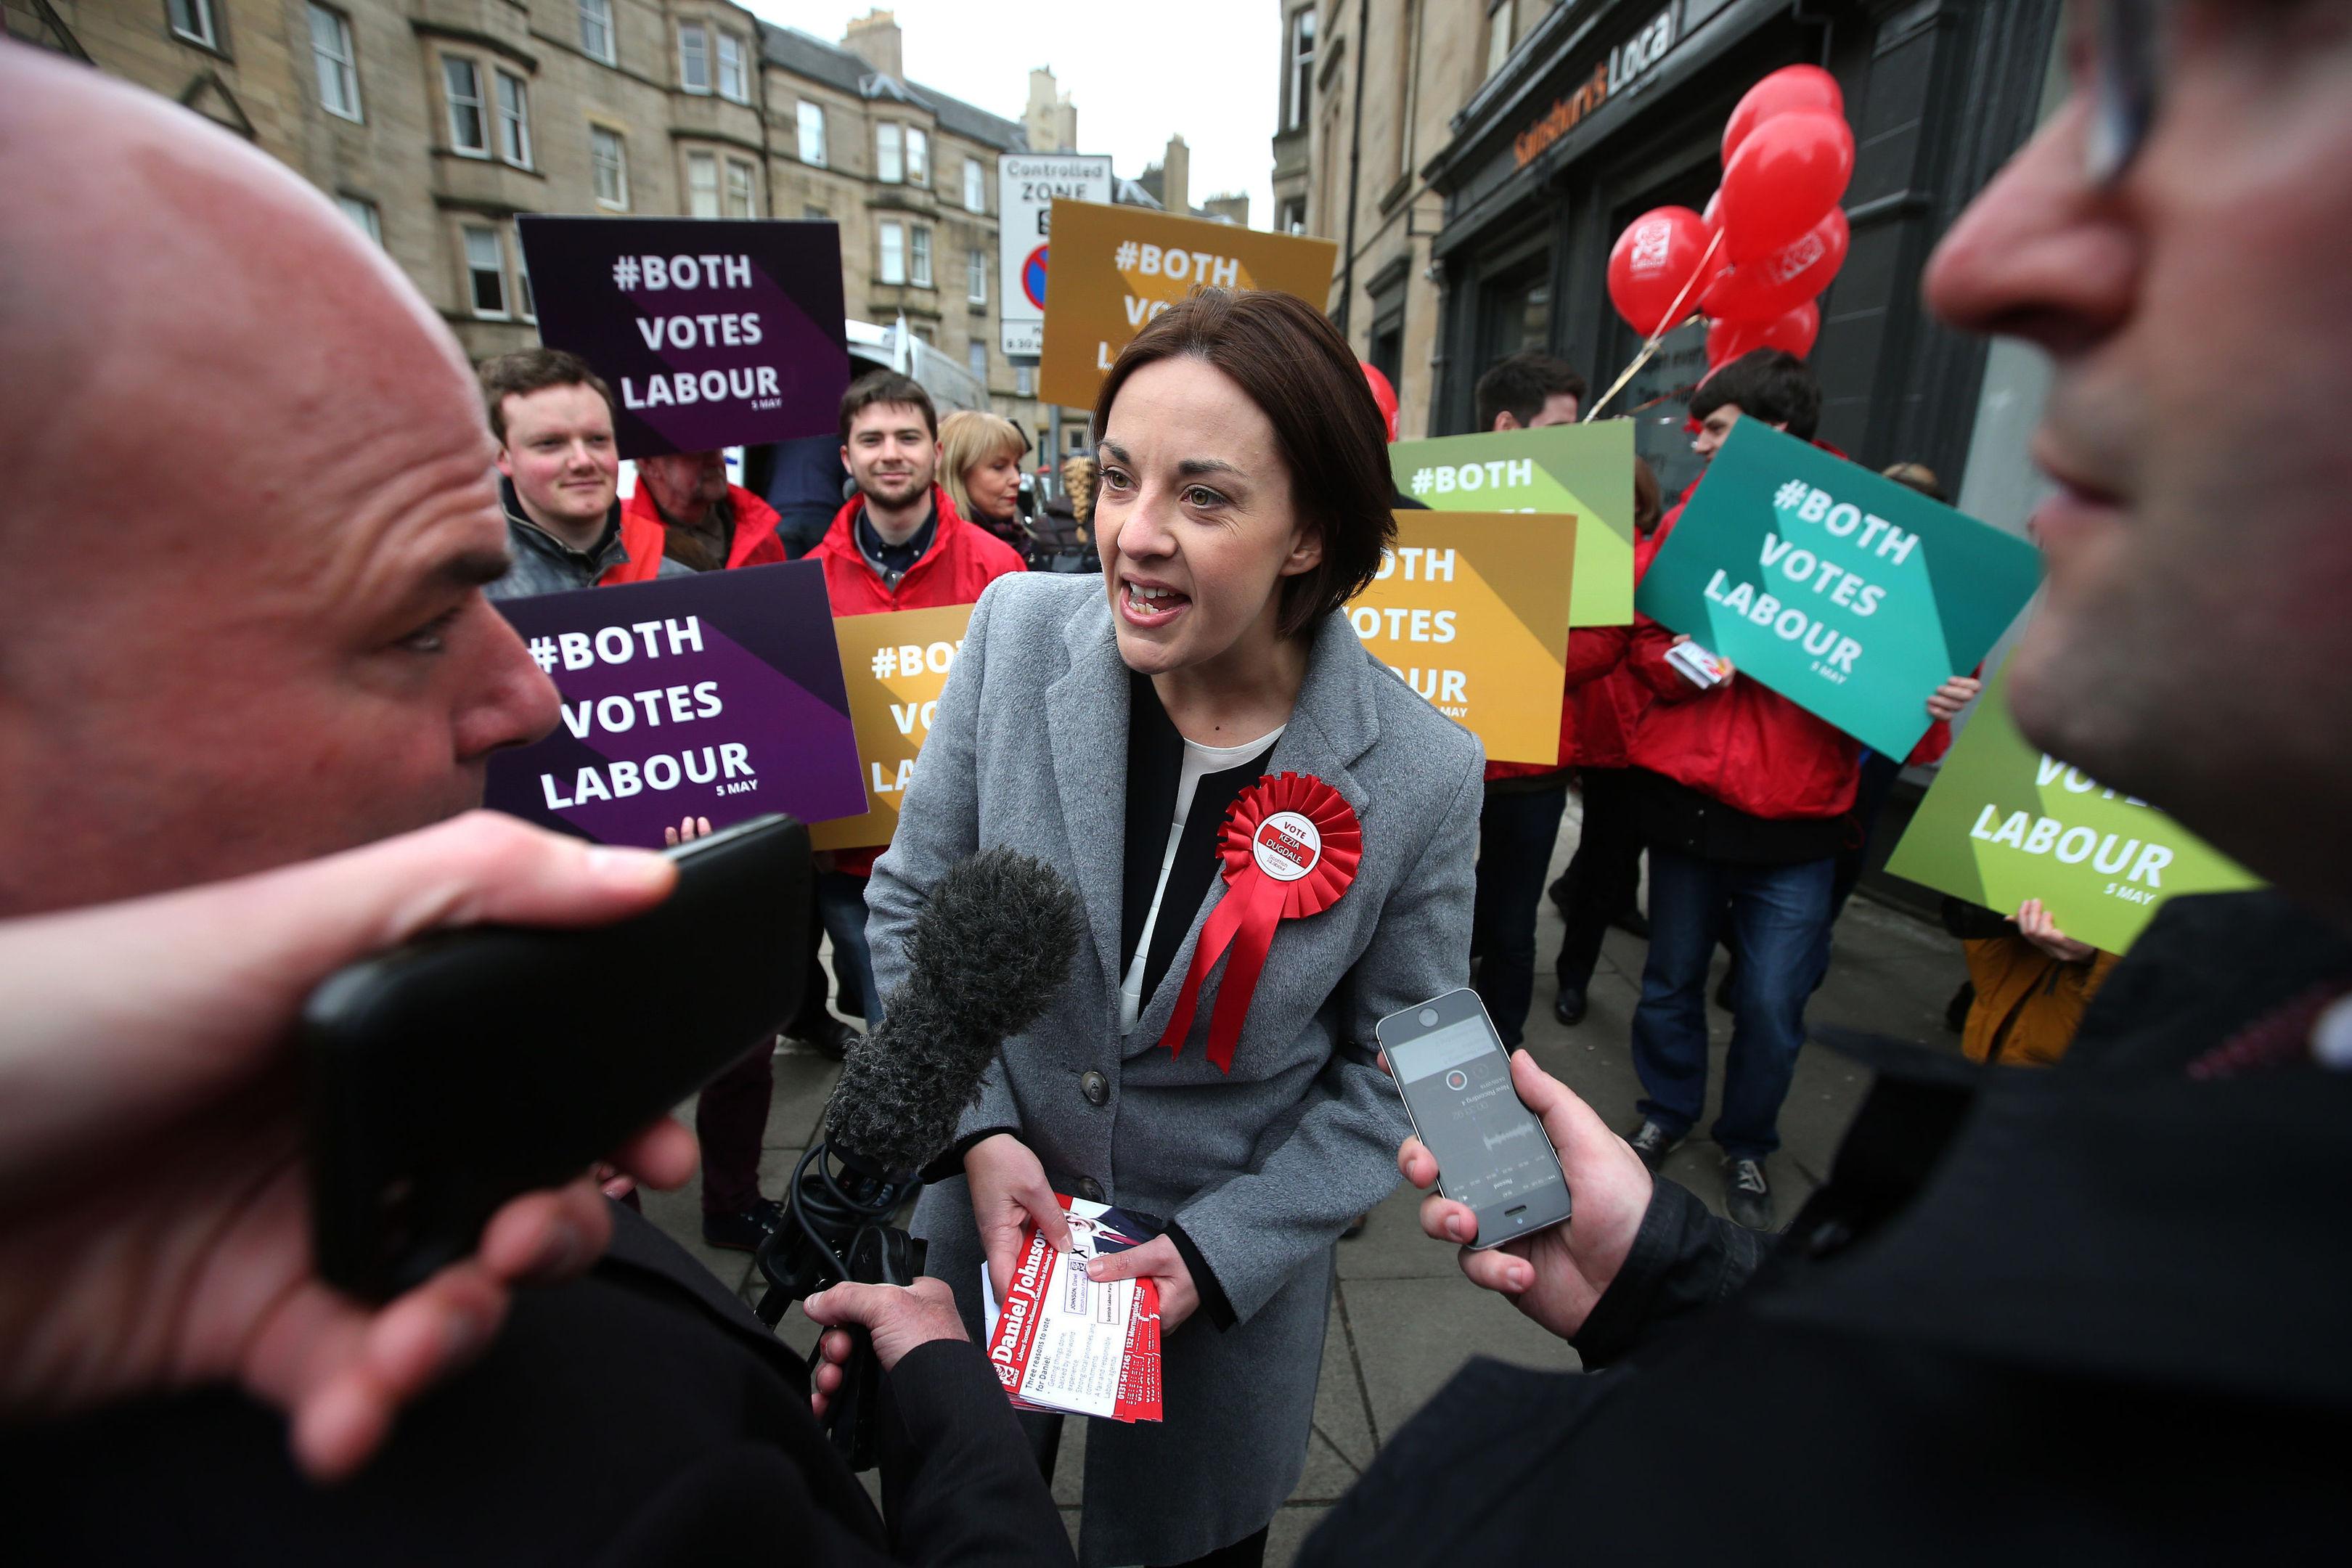 Scottish Labour leader Kezia Dugdale at a campaign event in Edinburgh.